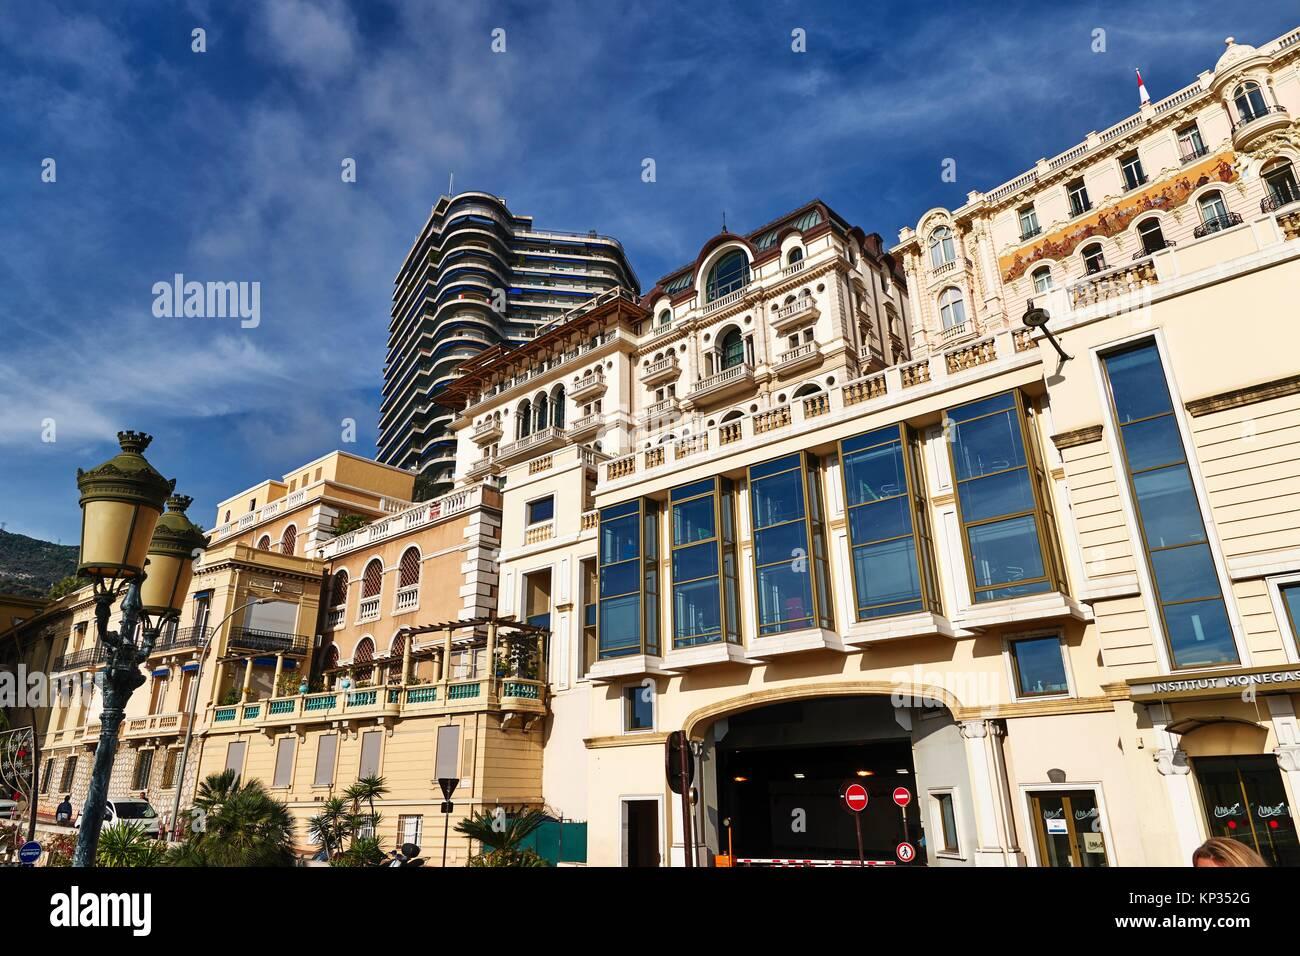 Montecarlo, Monaco Principality. Modern buildings, the Cardio Thoracic Center - Stock Image